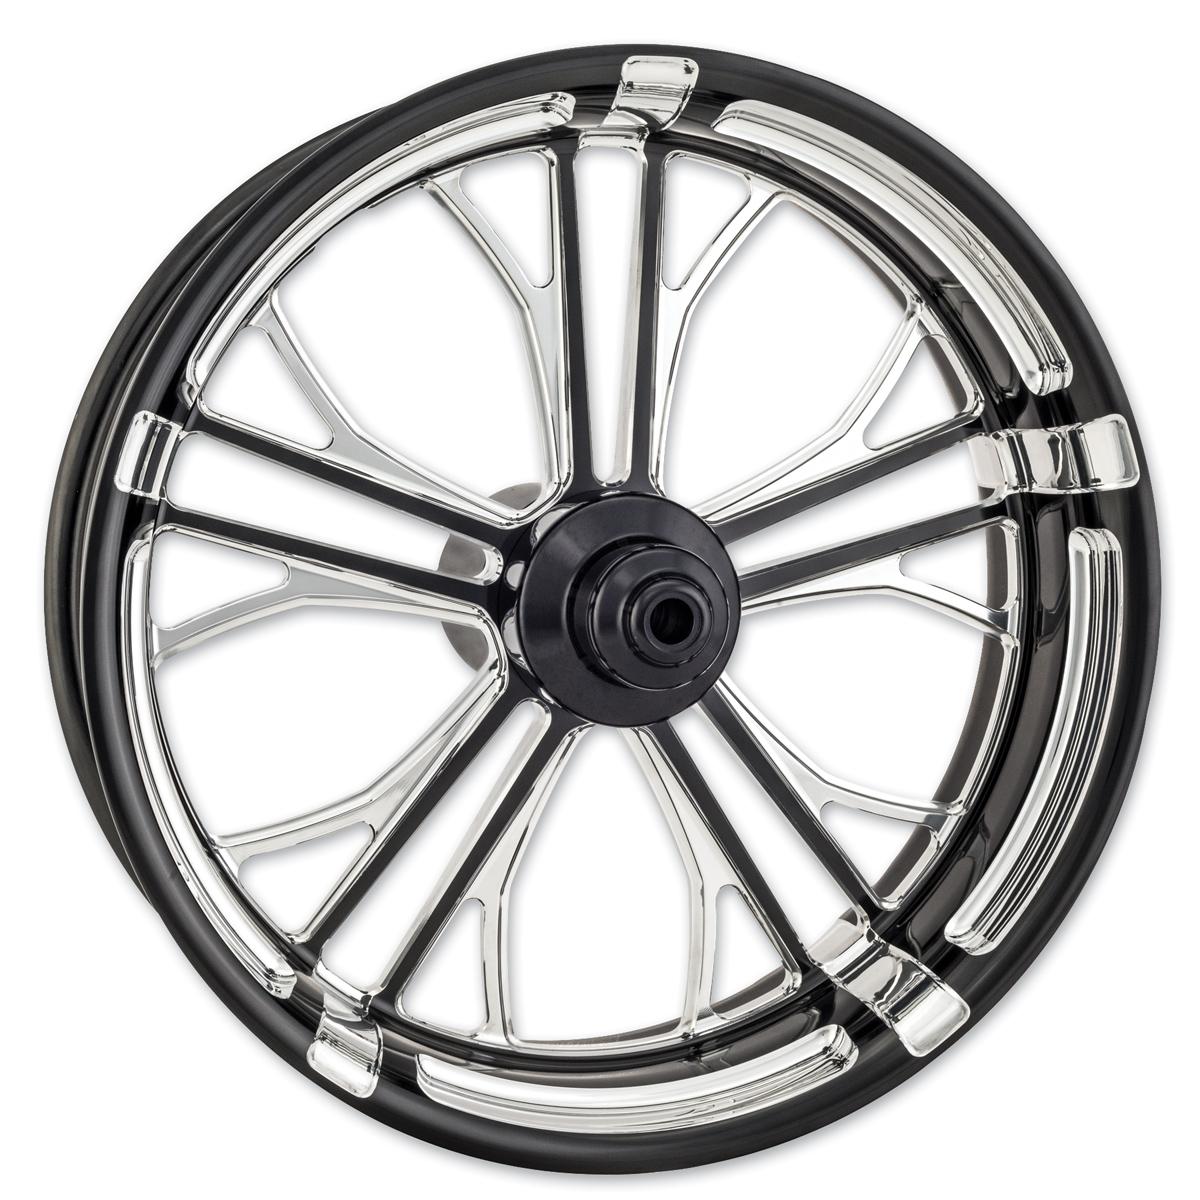 Performance Machine Dixon Platinum Cut Rear Wheel 17x6 ABS